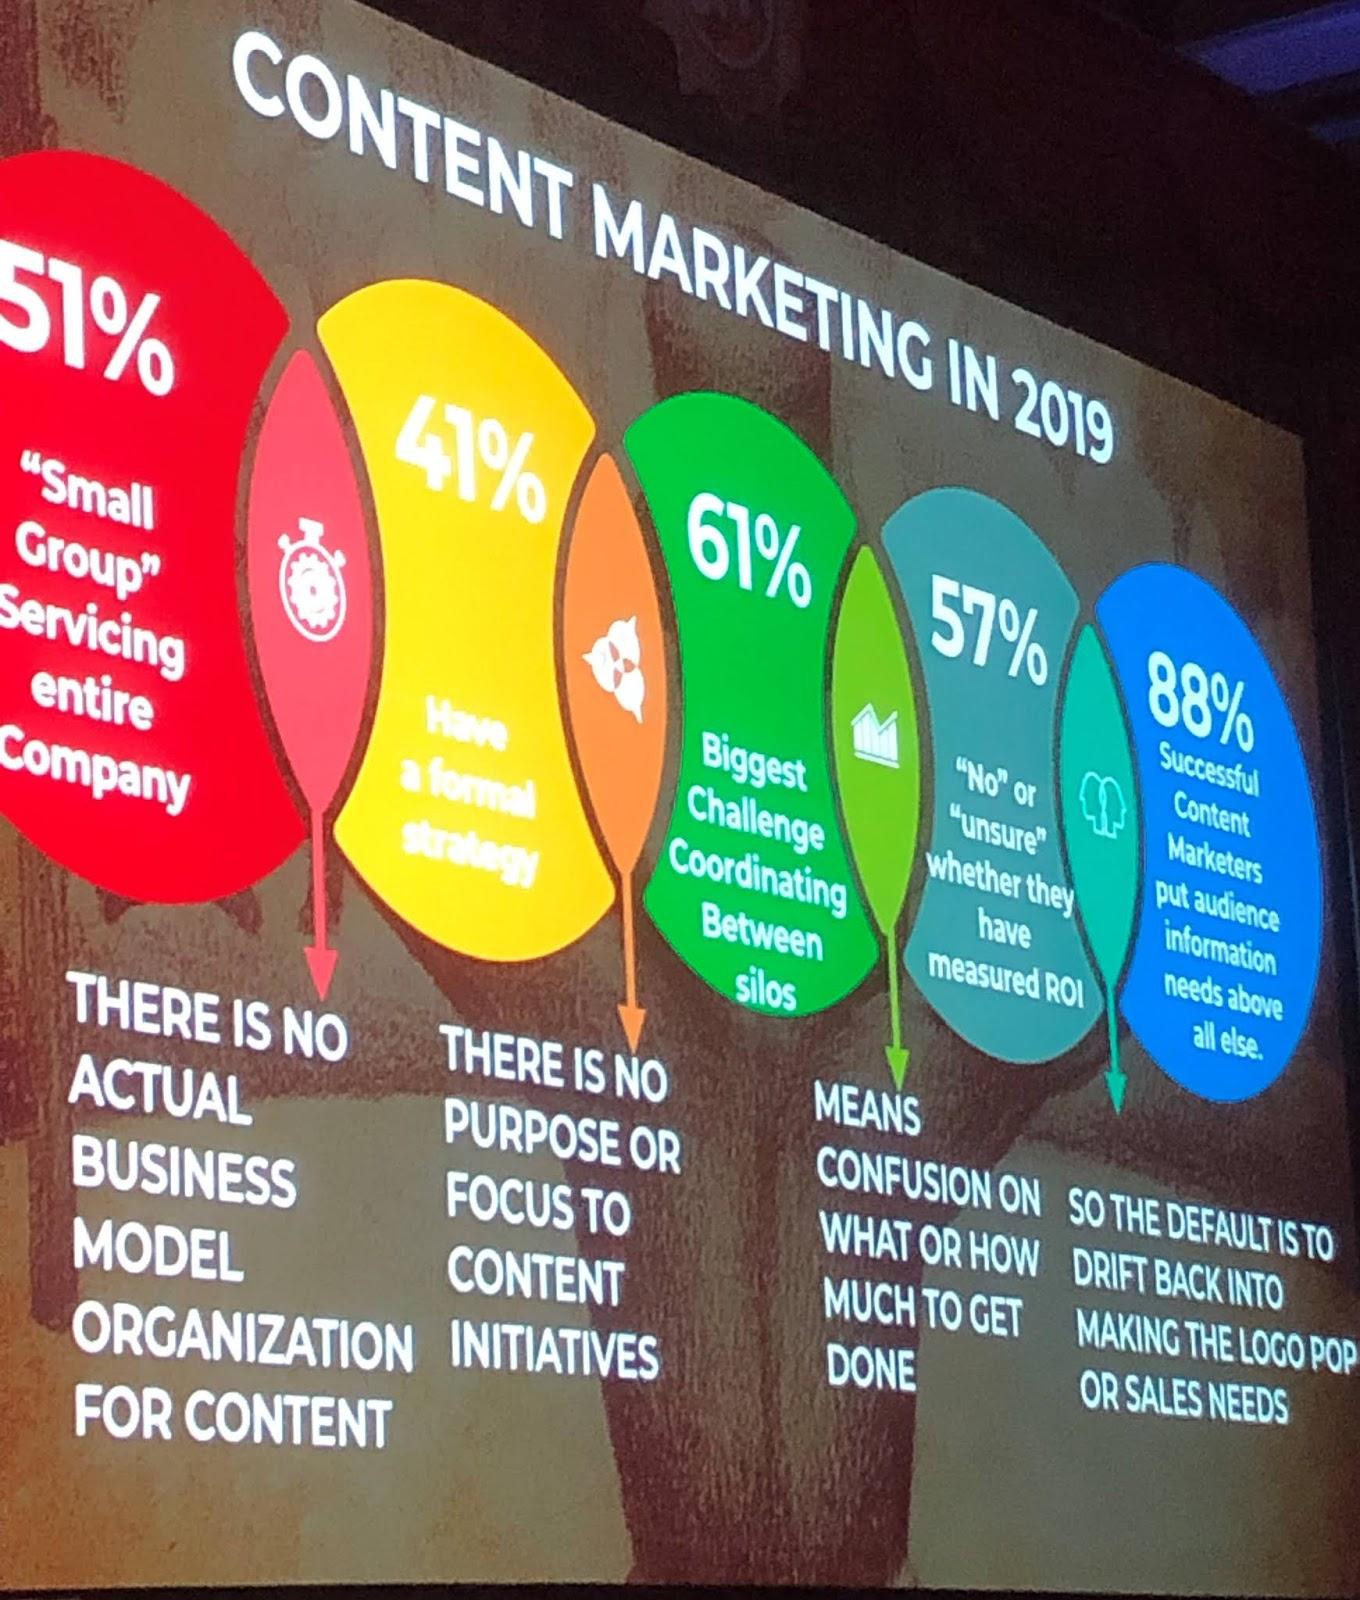 Robert Rose Slide from Content Marketing World 2019